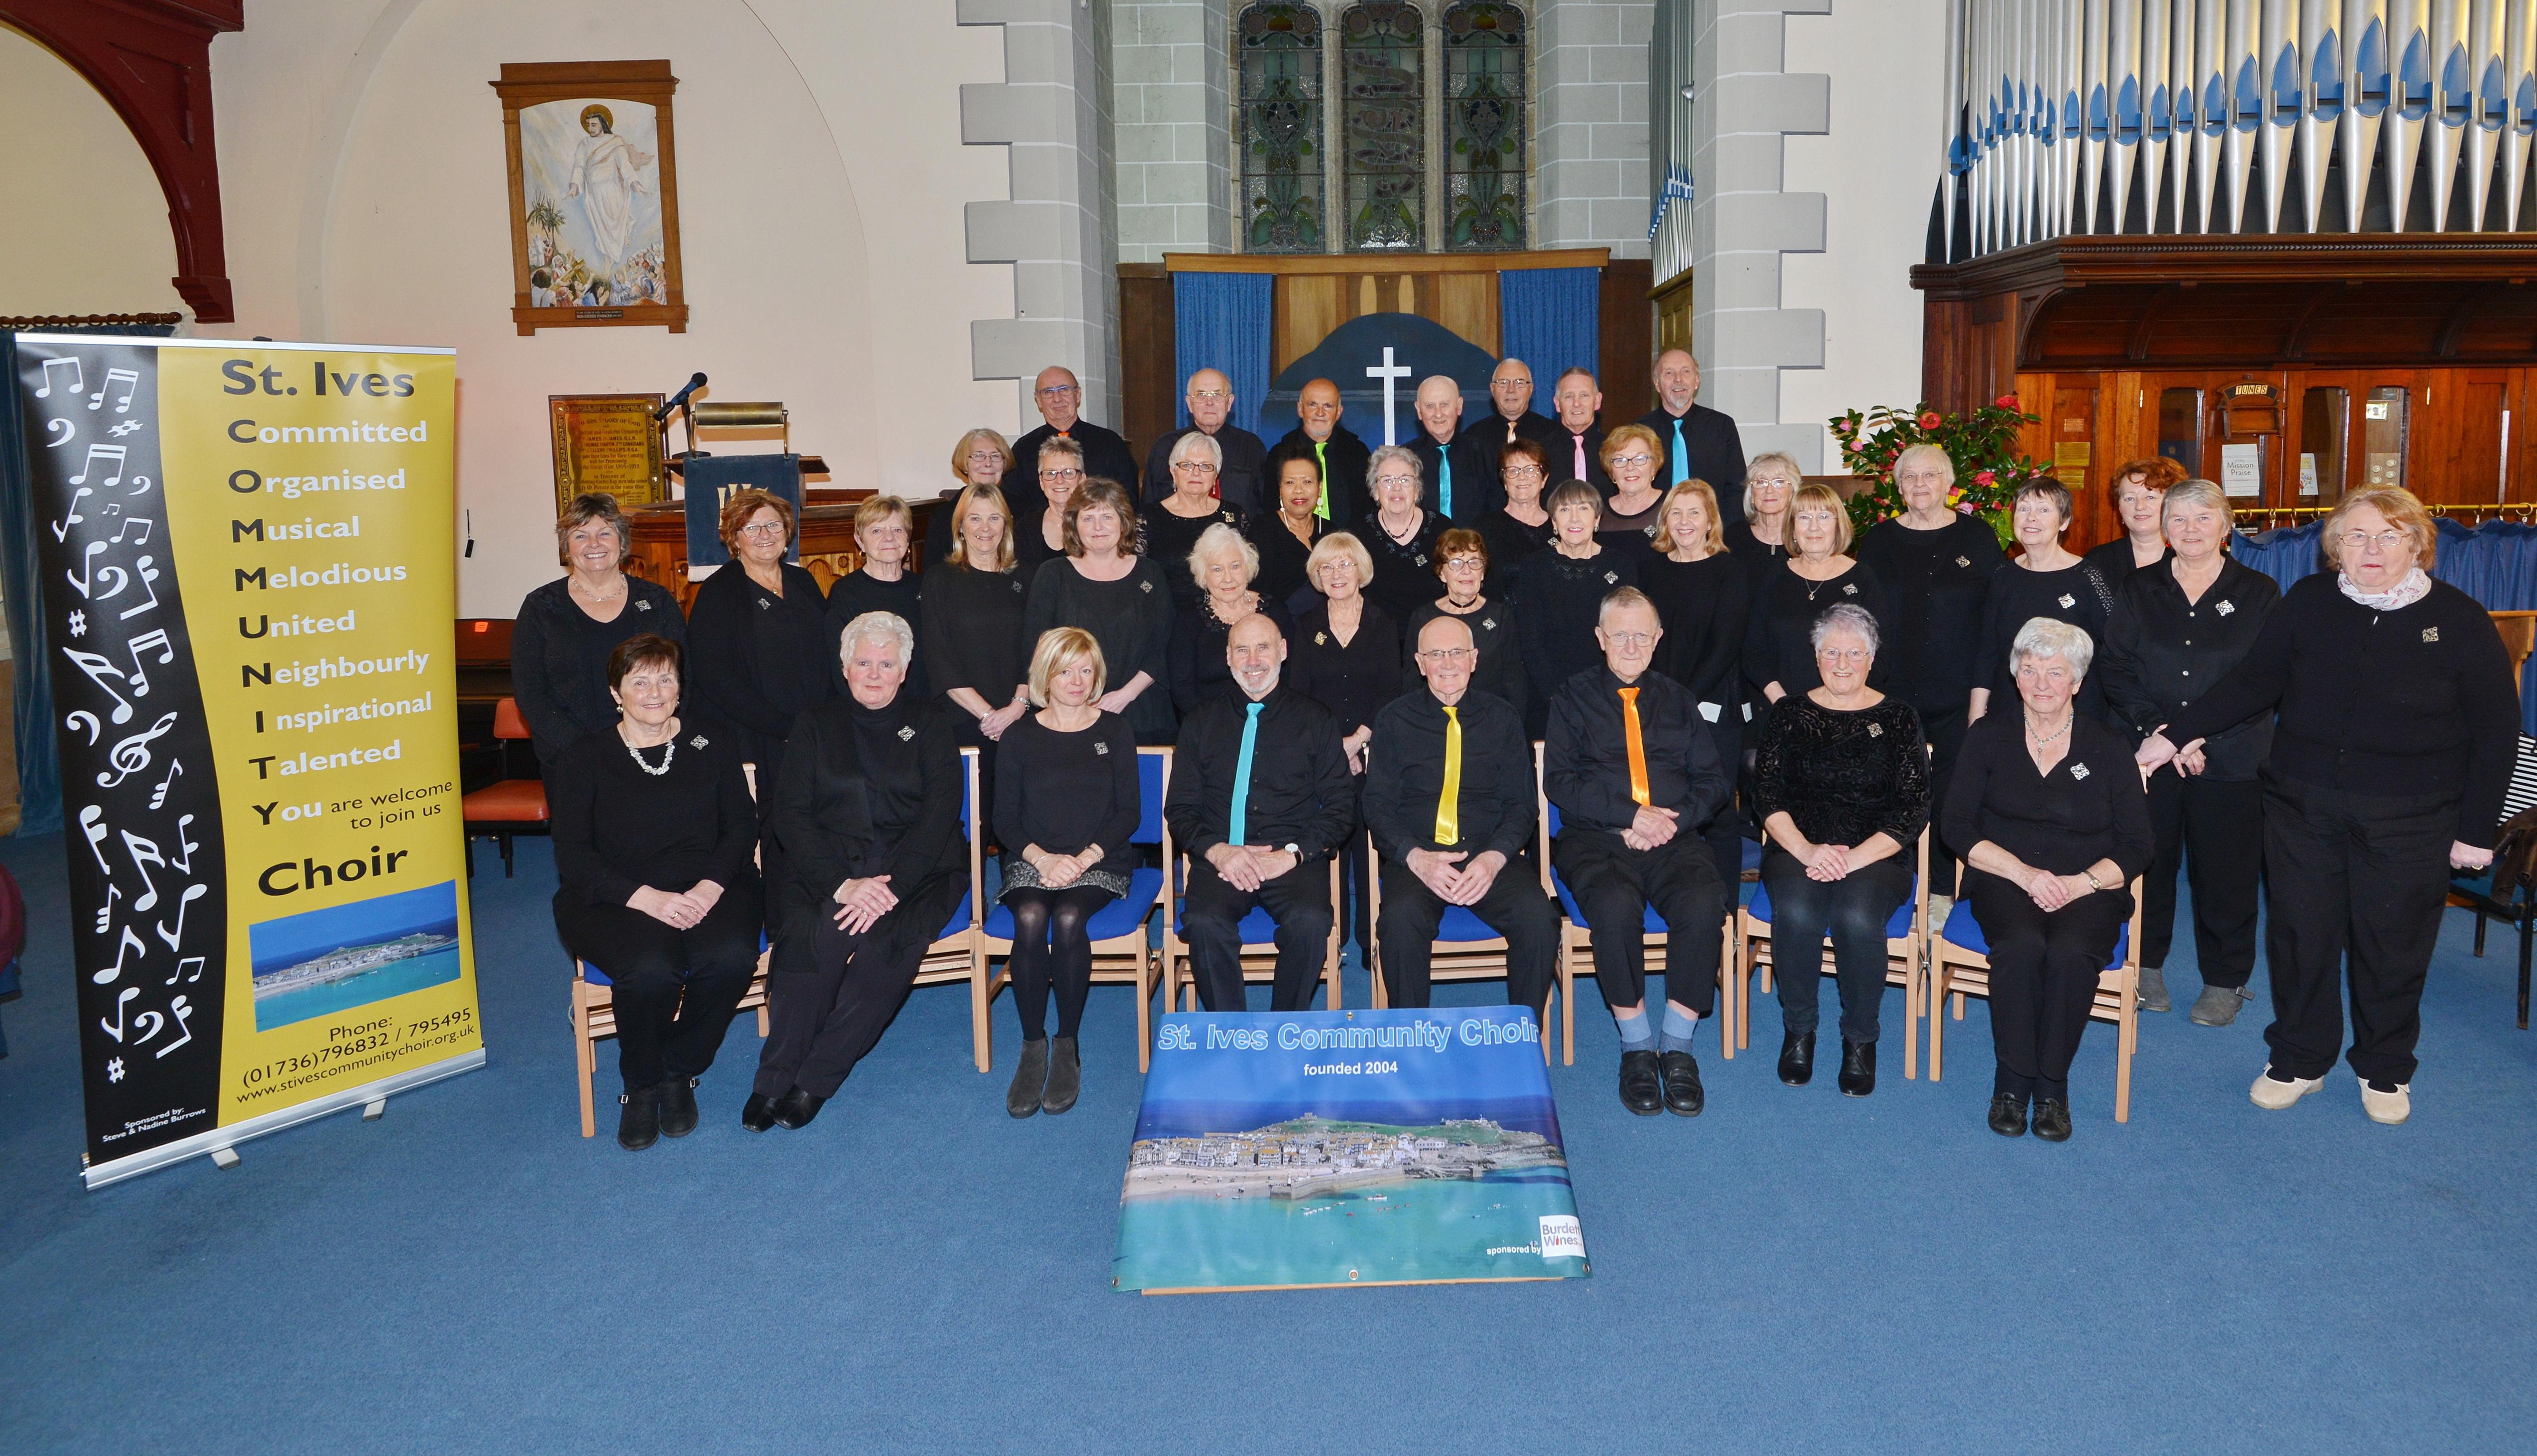 St. Ives Community Choir